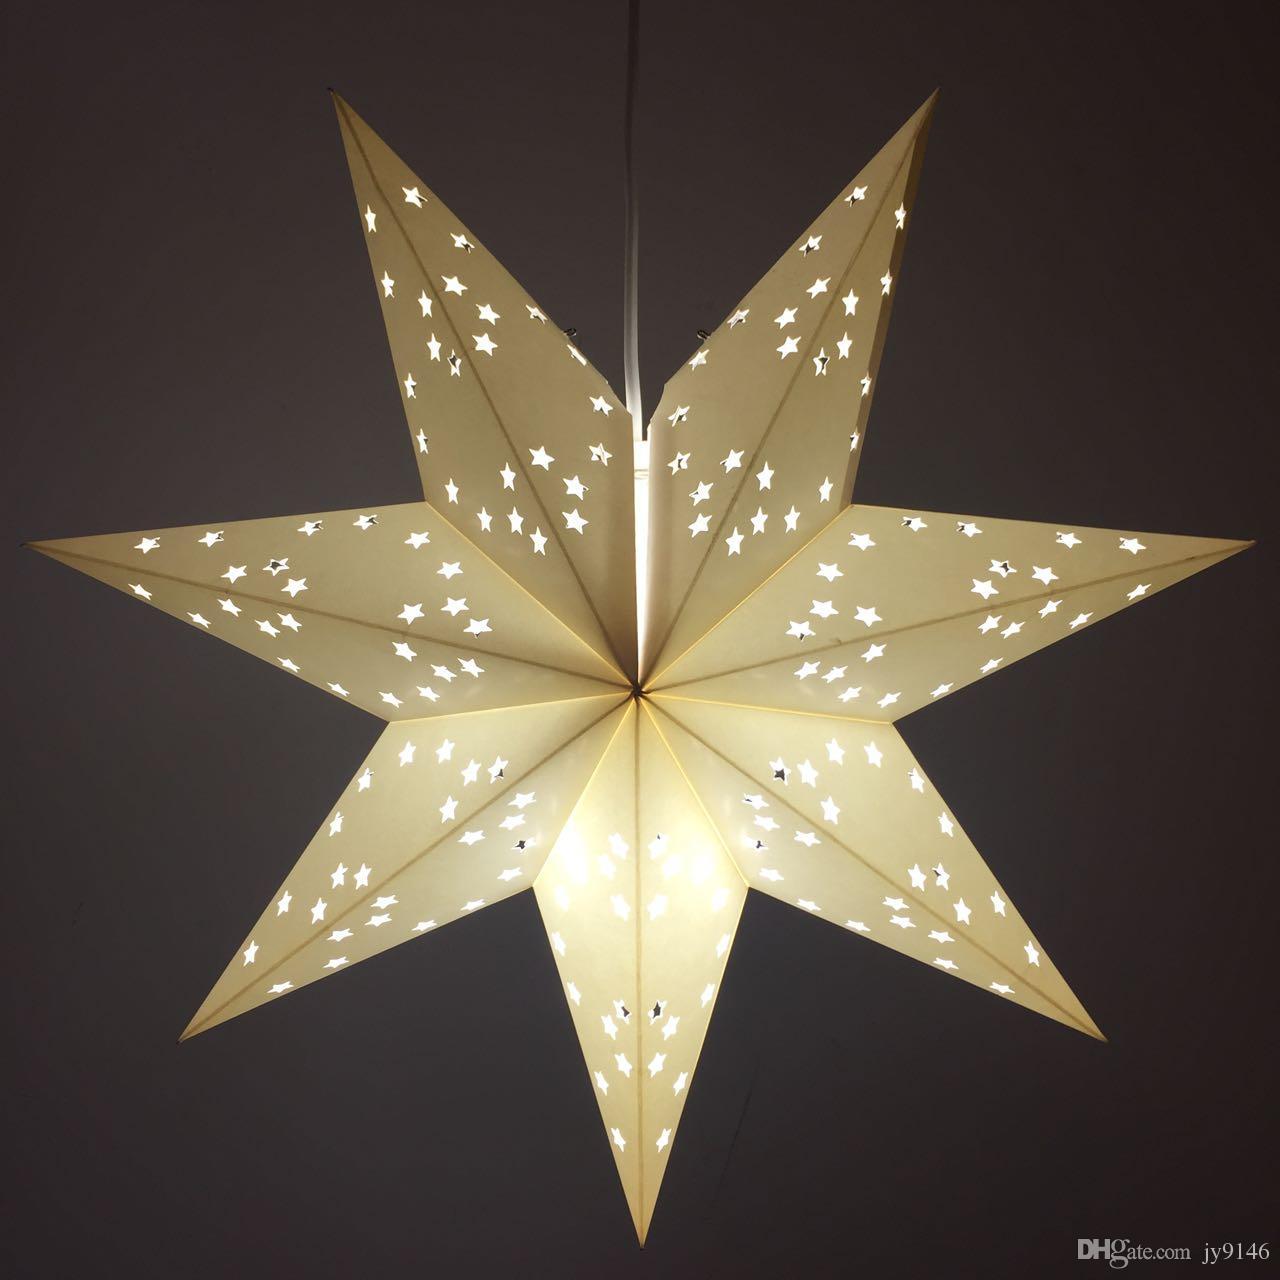 Wholesale Morden Craft Paper Party Pendent Lantern Light Diy Star